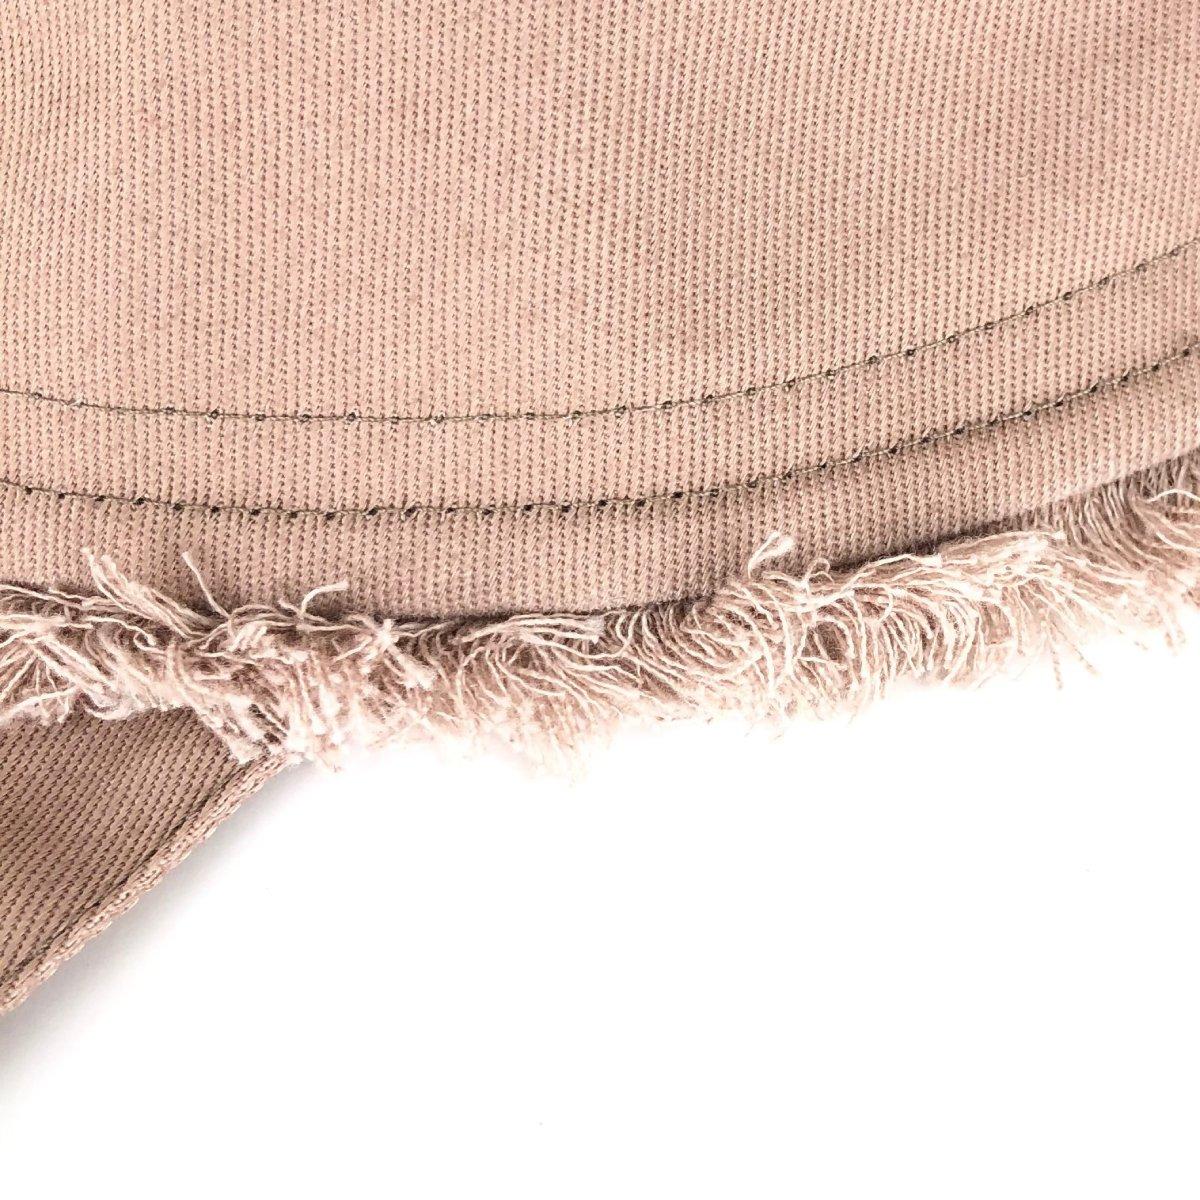 【BABY】Baby Fringe Hat 詳細画像12